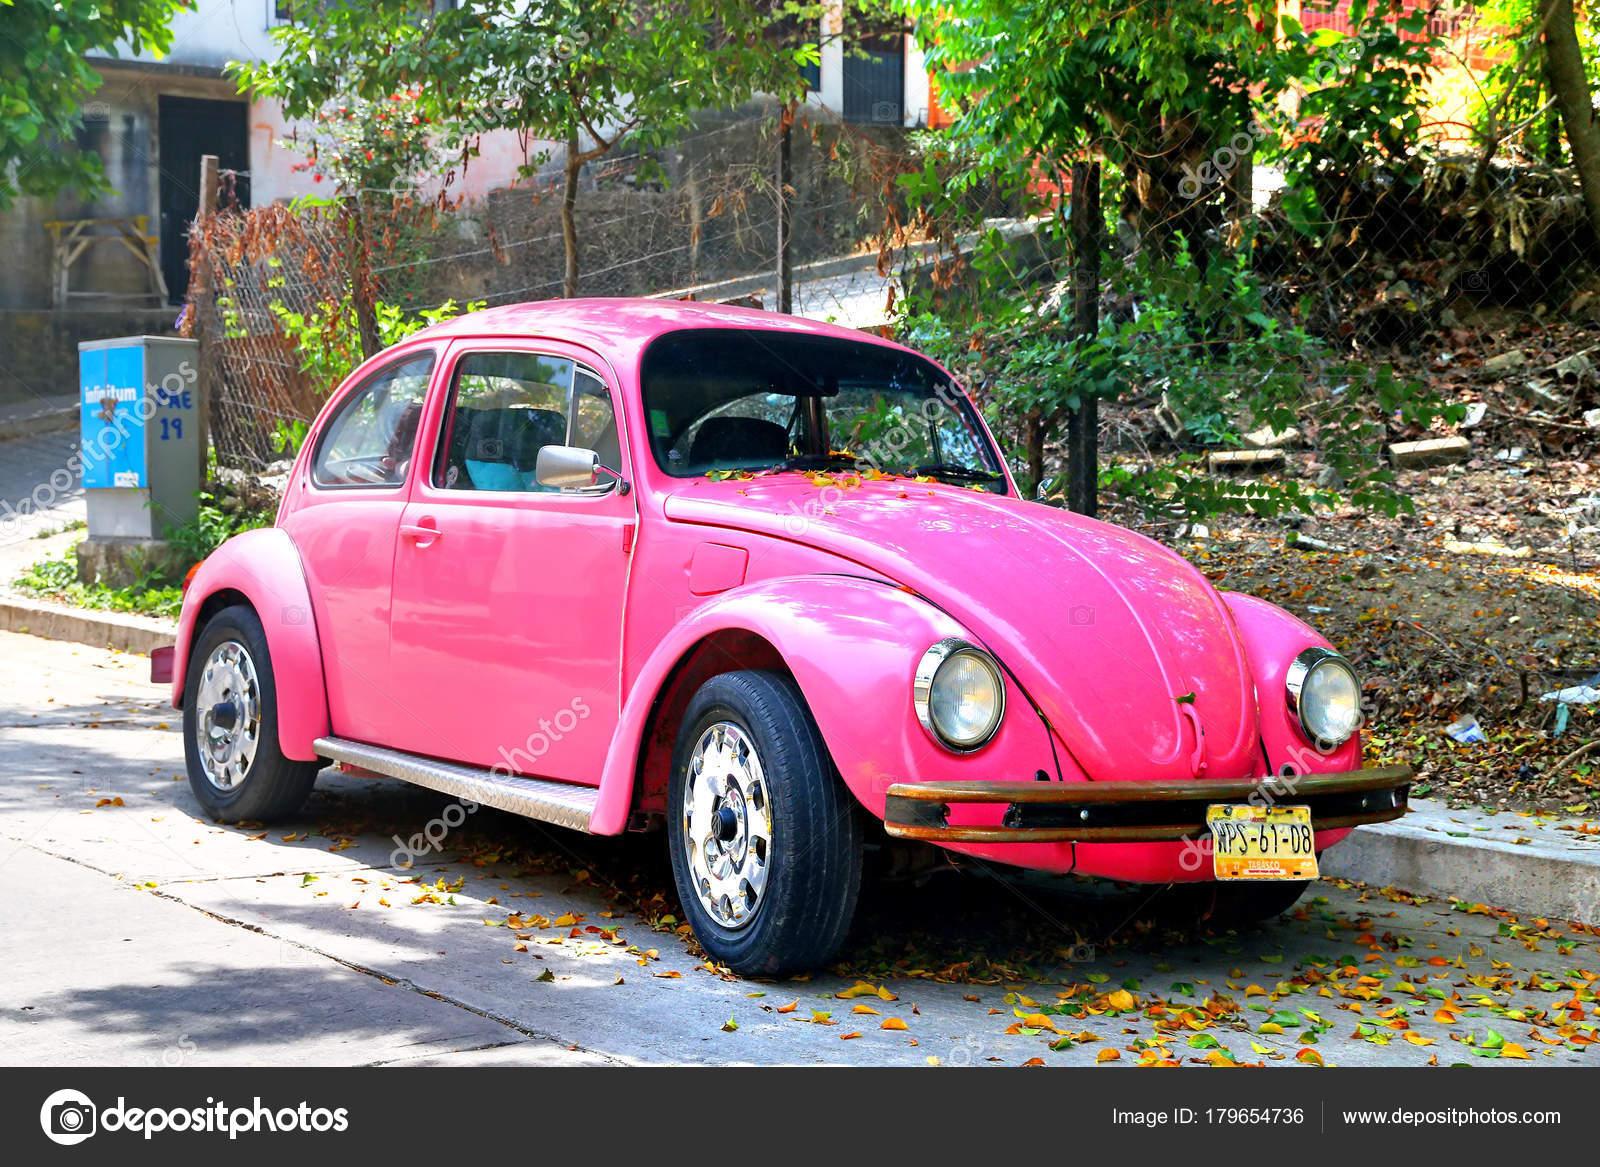 model beetle pink buy volkswagen concept max vw fbx lws edition vehicles lwo models lw ma